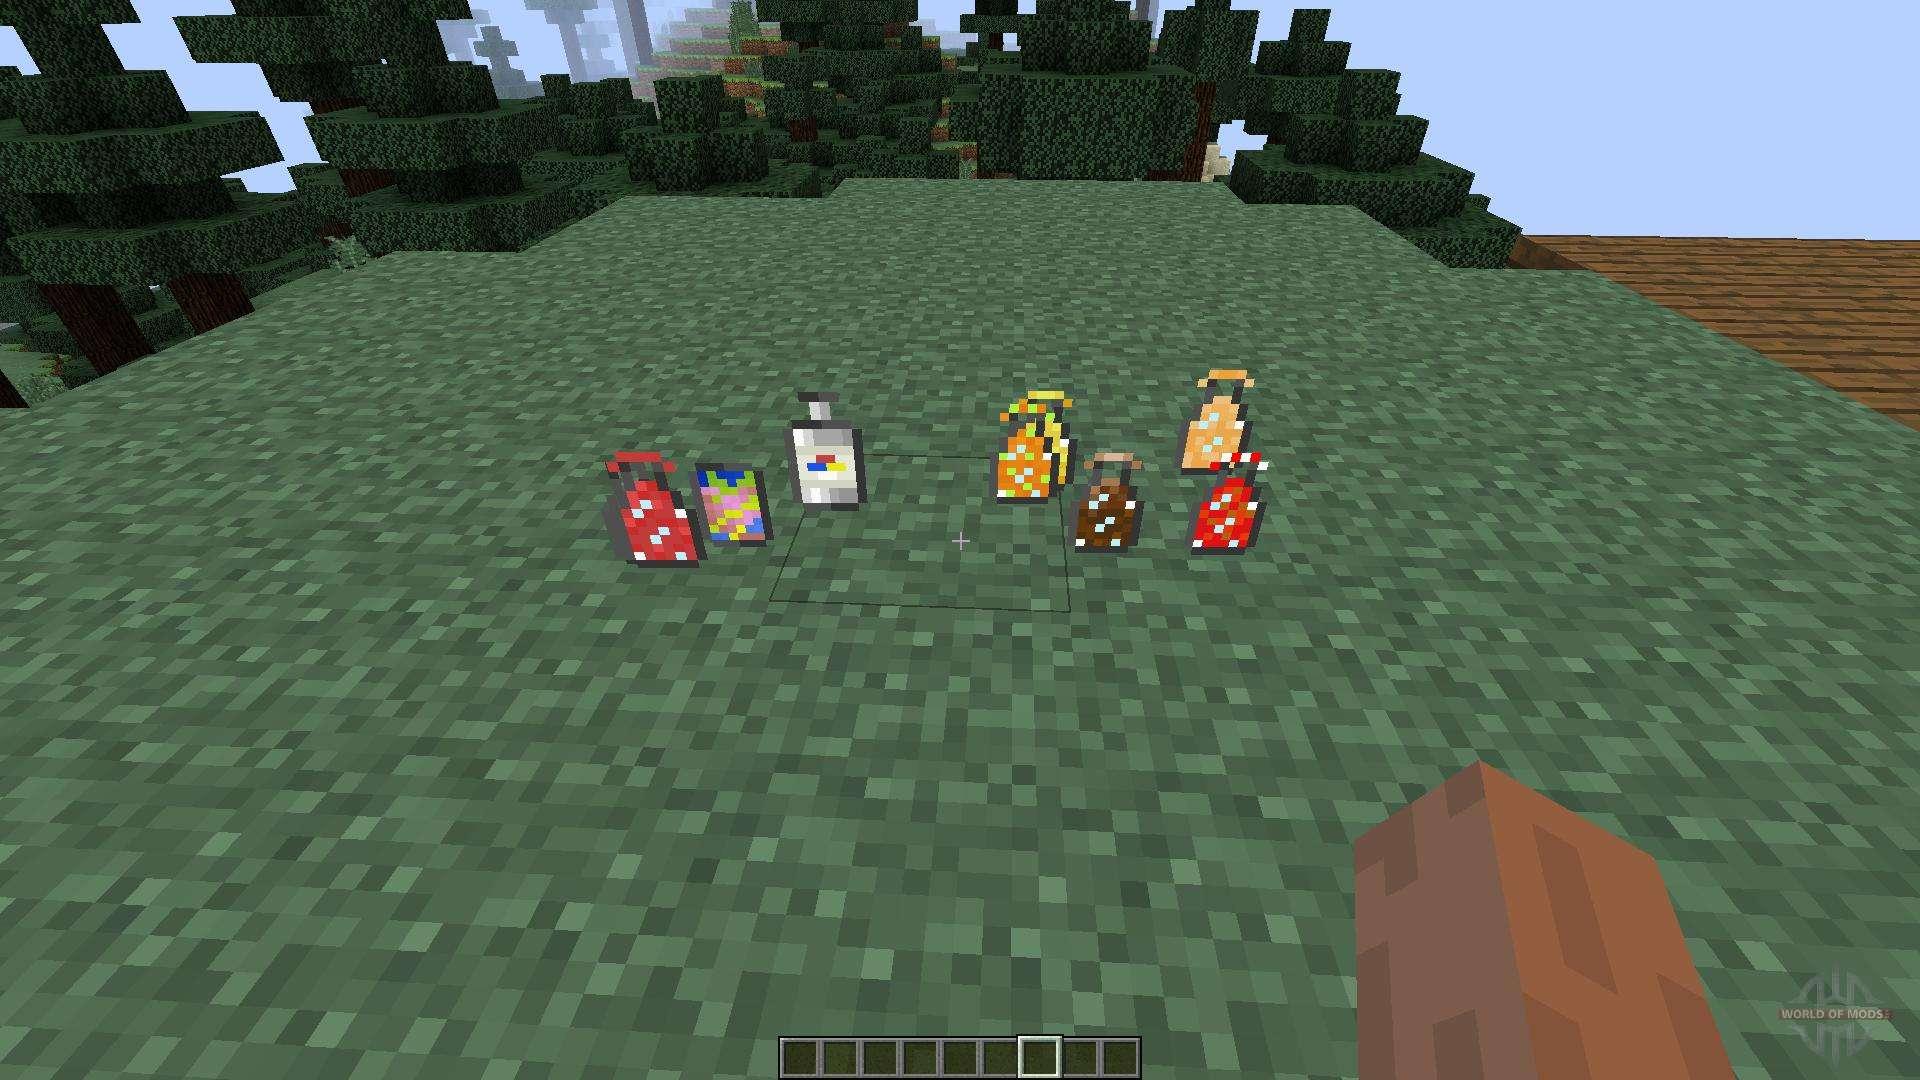 Minecraft 1.7.2 Mods | File-minecraft.com 1.7.2 Mod List